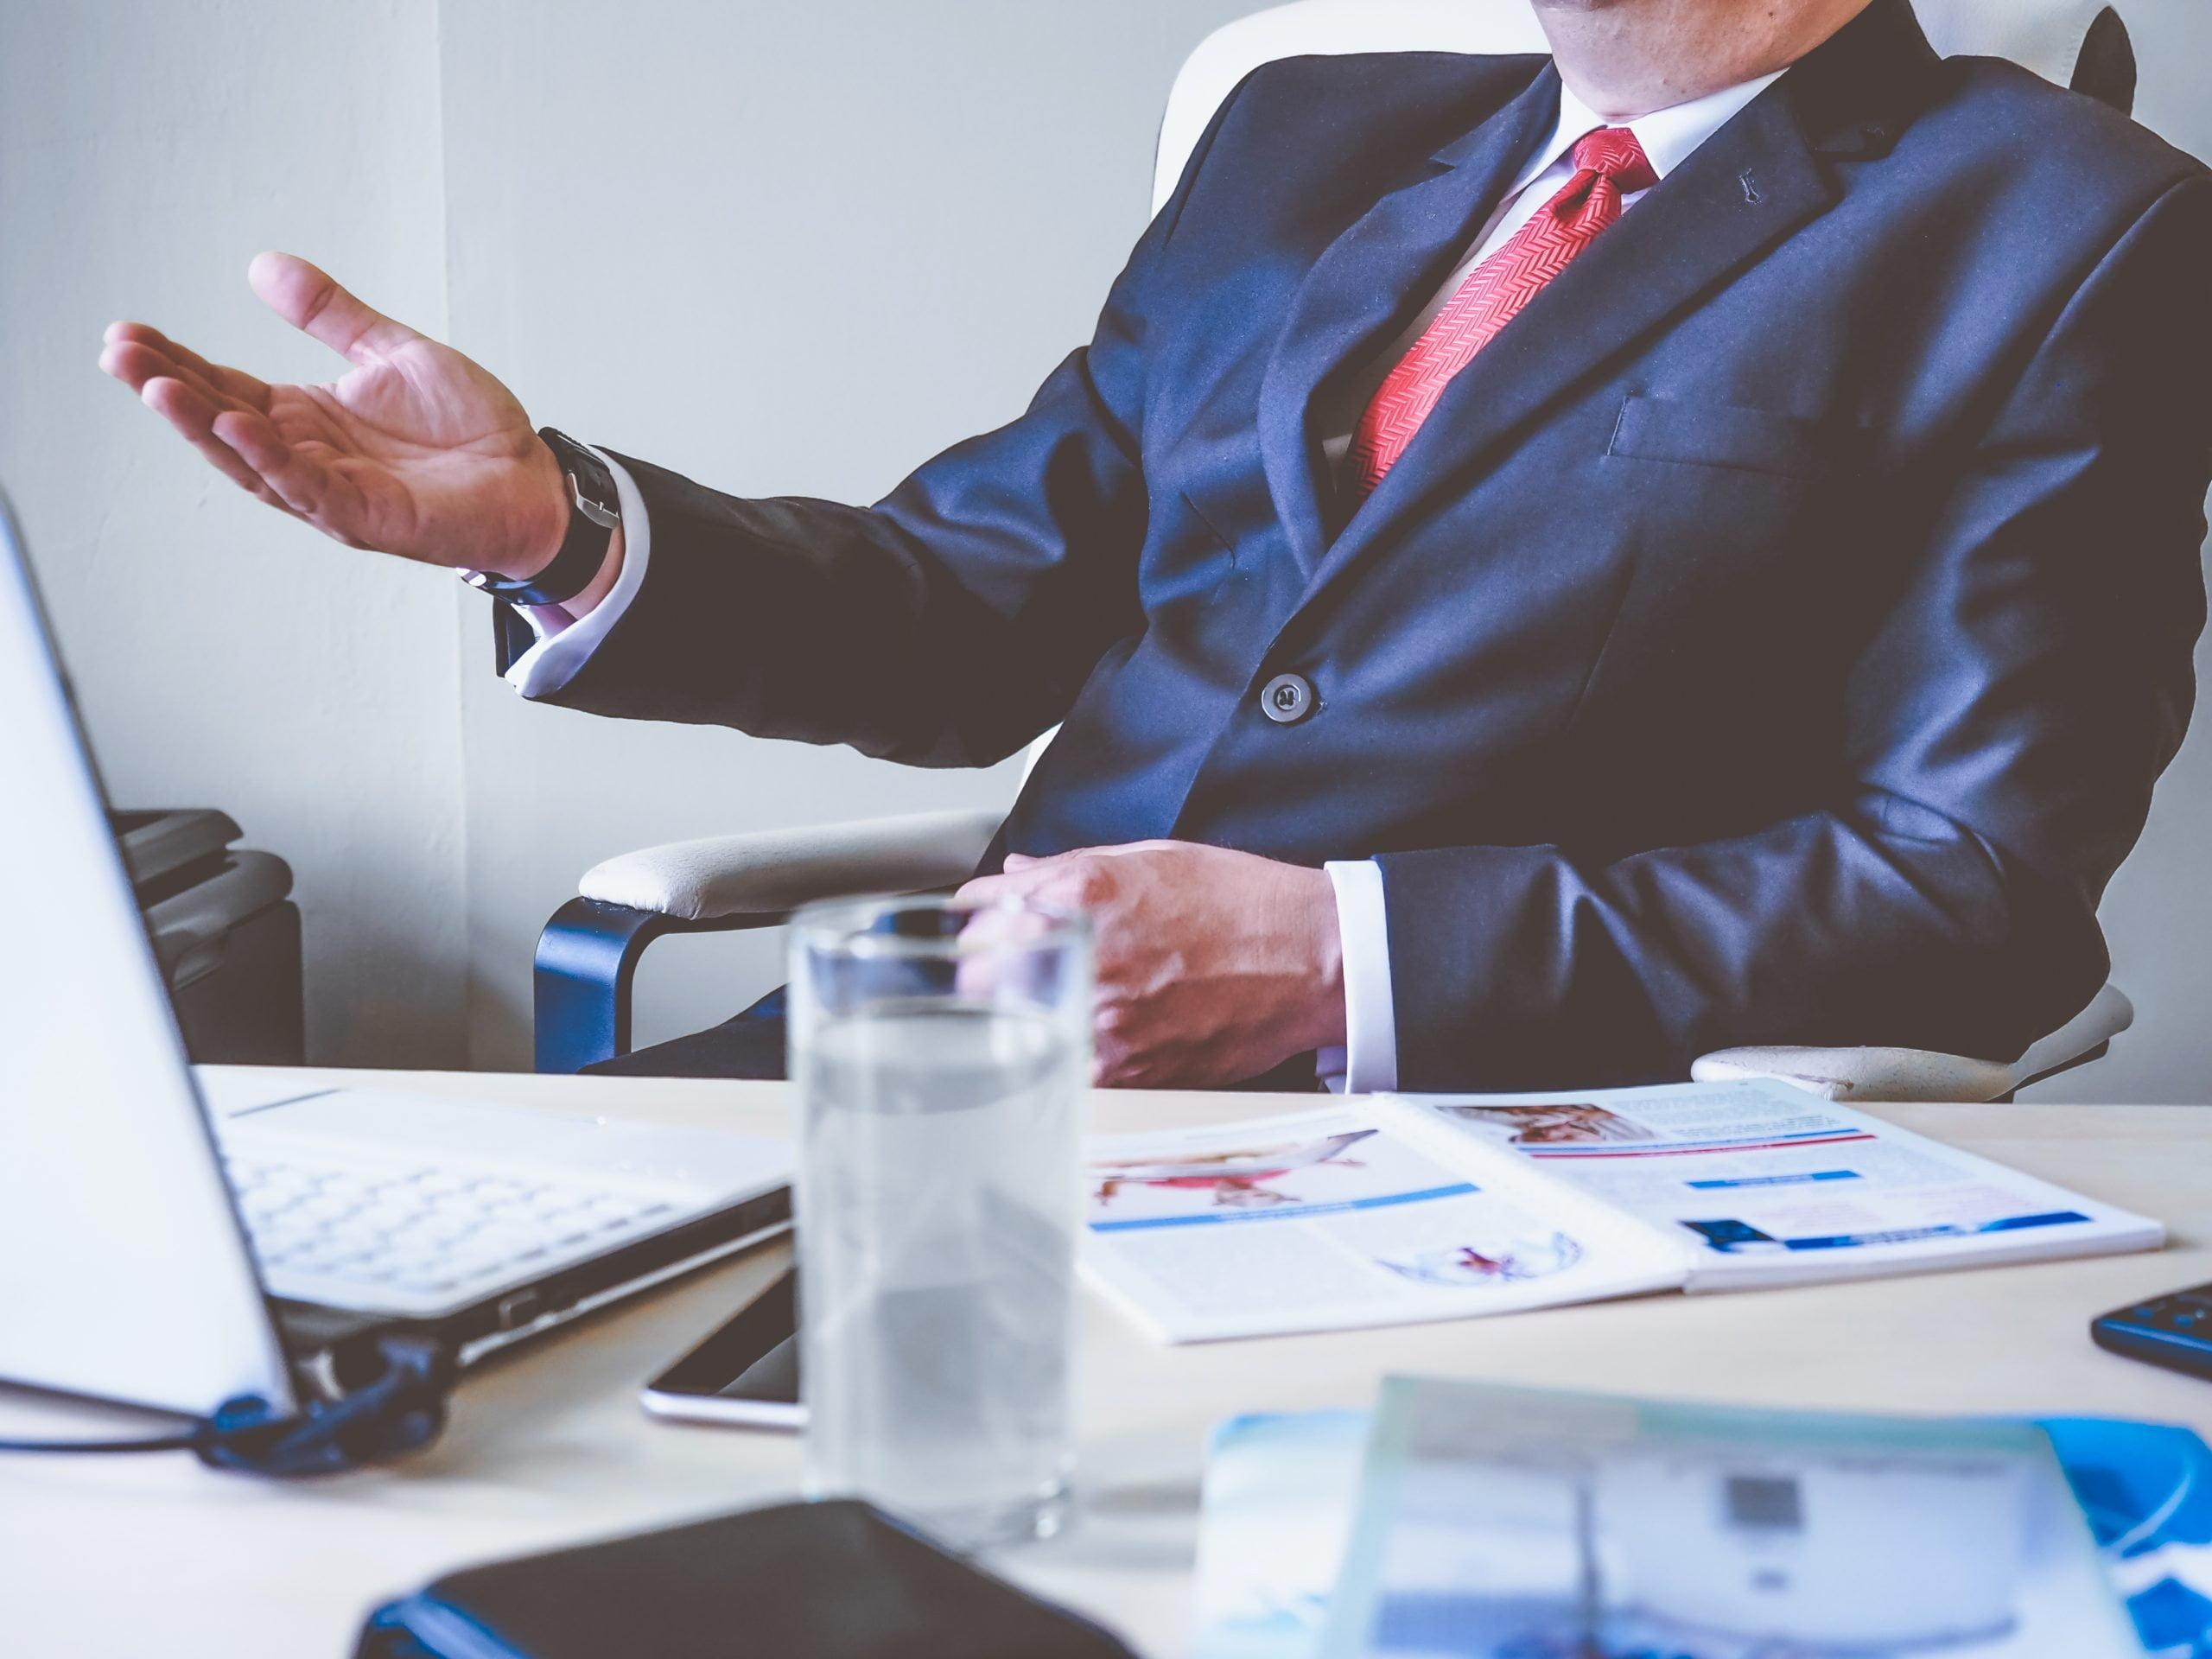 5 Tips for Finance Companies to Host a Successful Virtual Job Fair